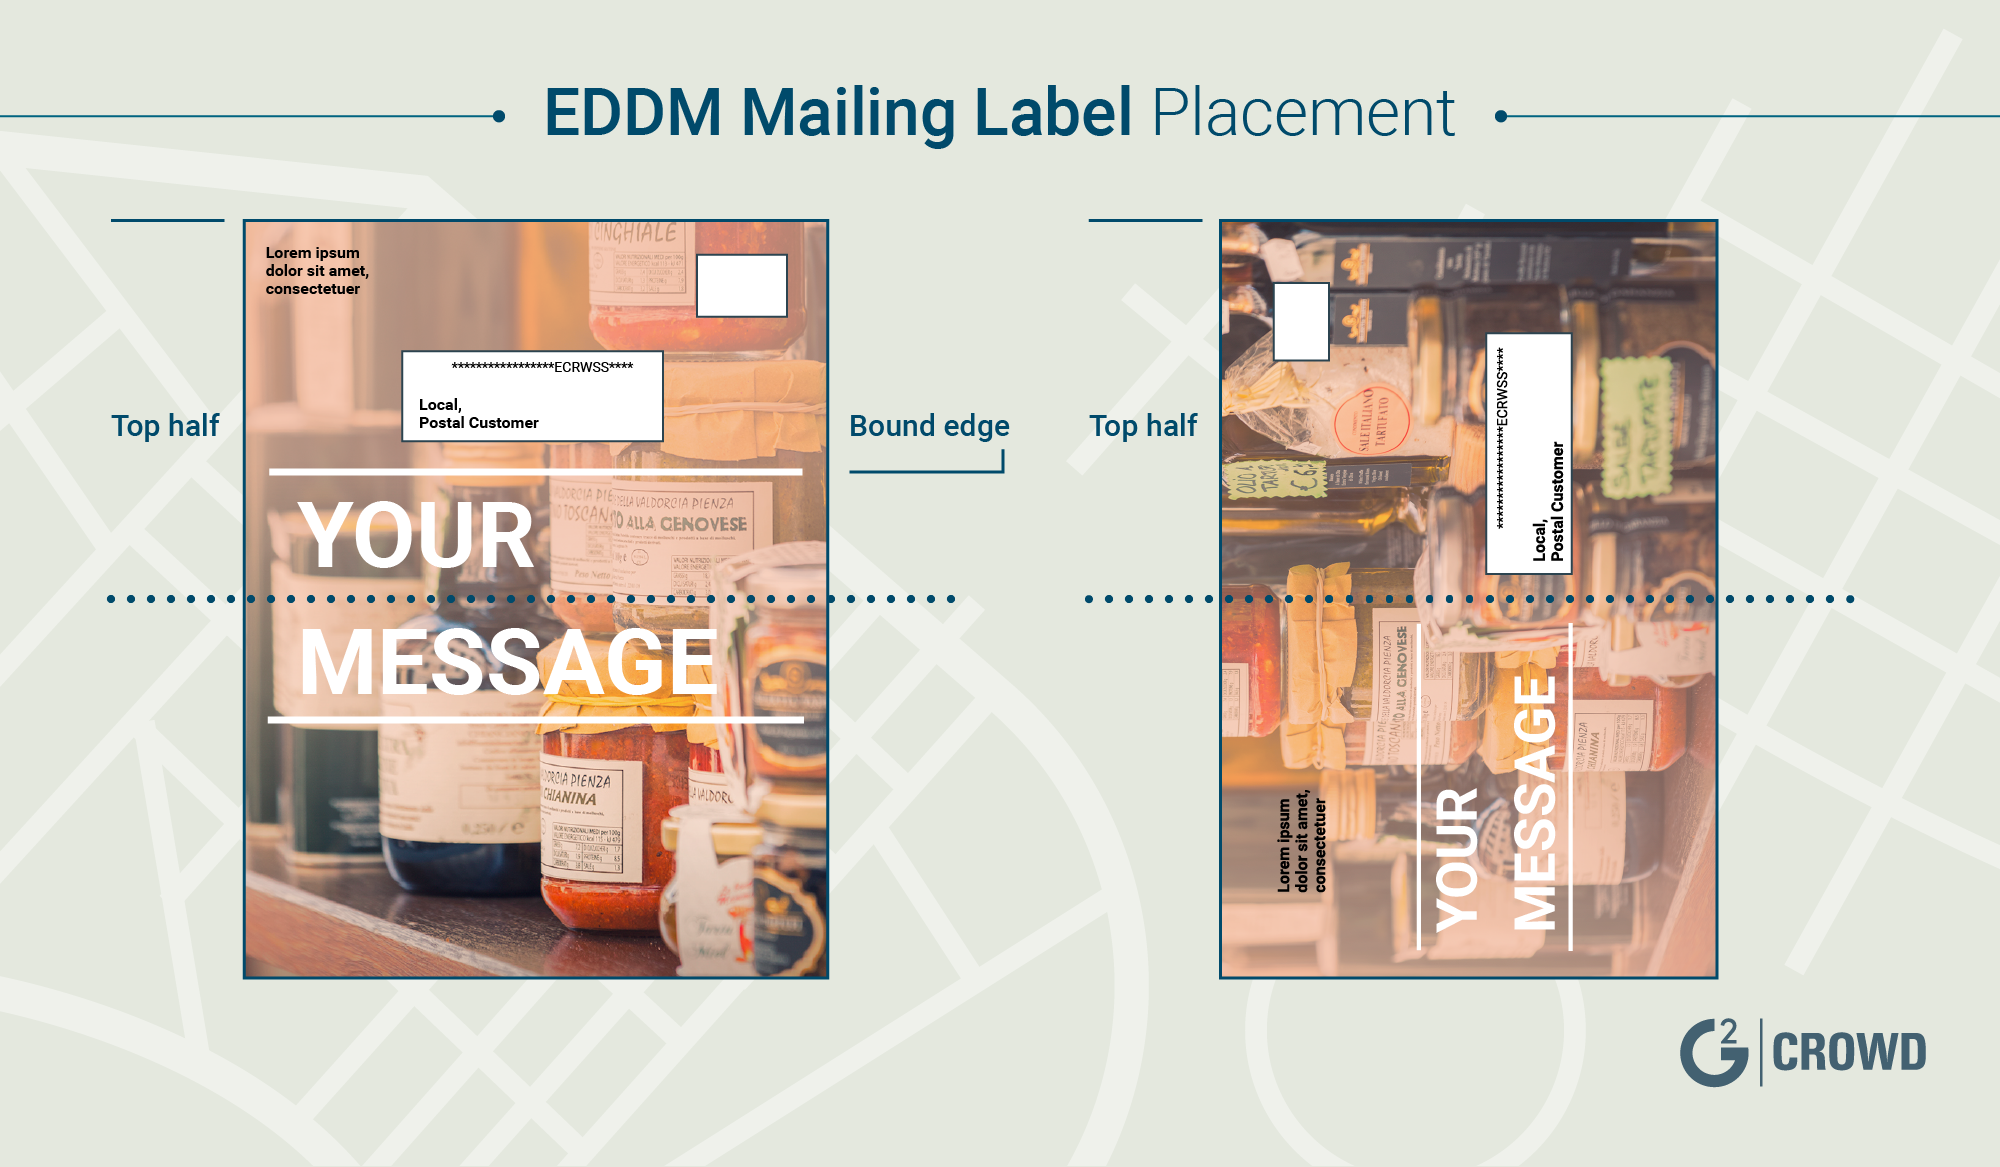 eddm-mailing-requirements